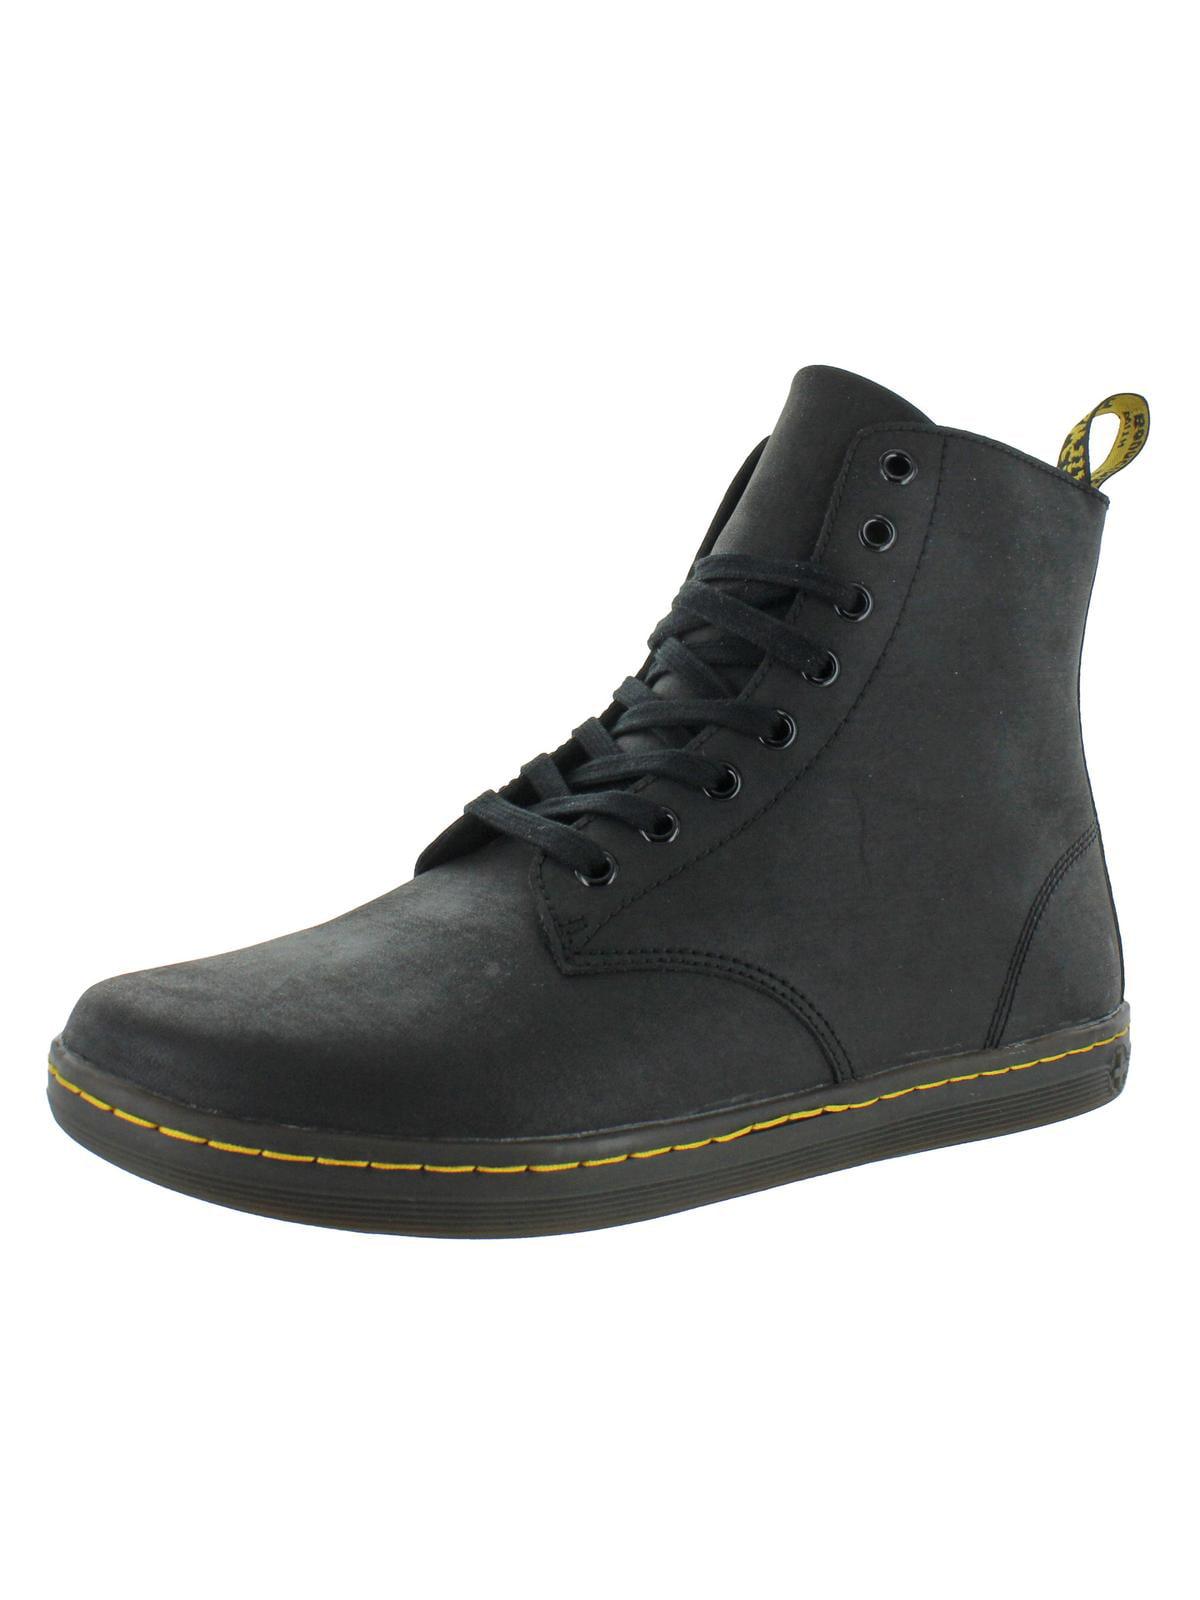 47f1cbacf80 Dr. Martens Tobias 8 Eye Boot Black Uk 10